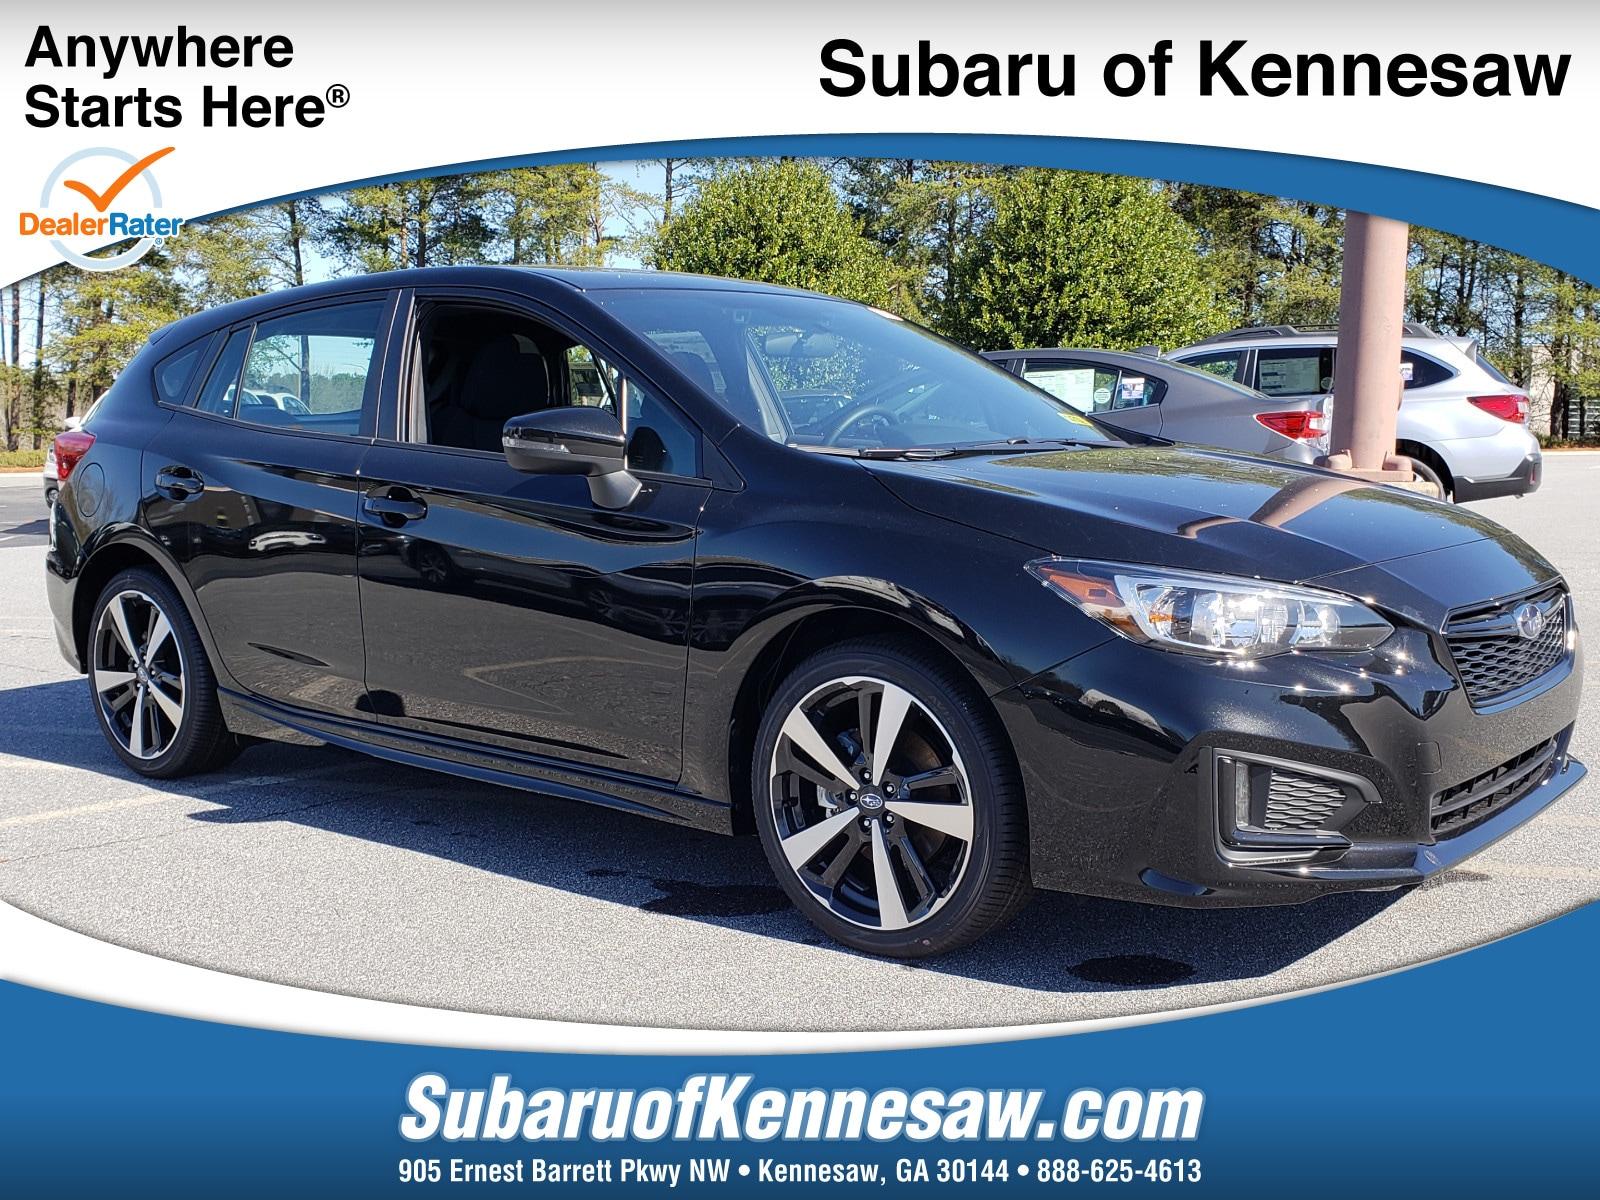 New 2019 Subaru Impreza 2.0i Sport 5-door in Kennesaw GA